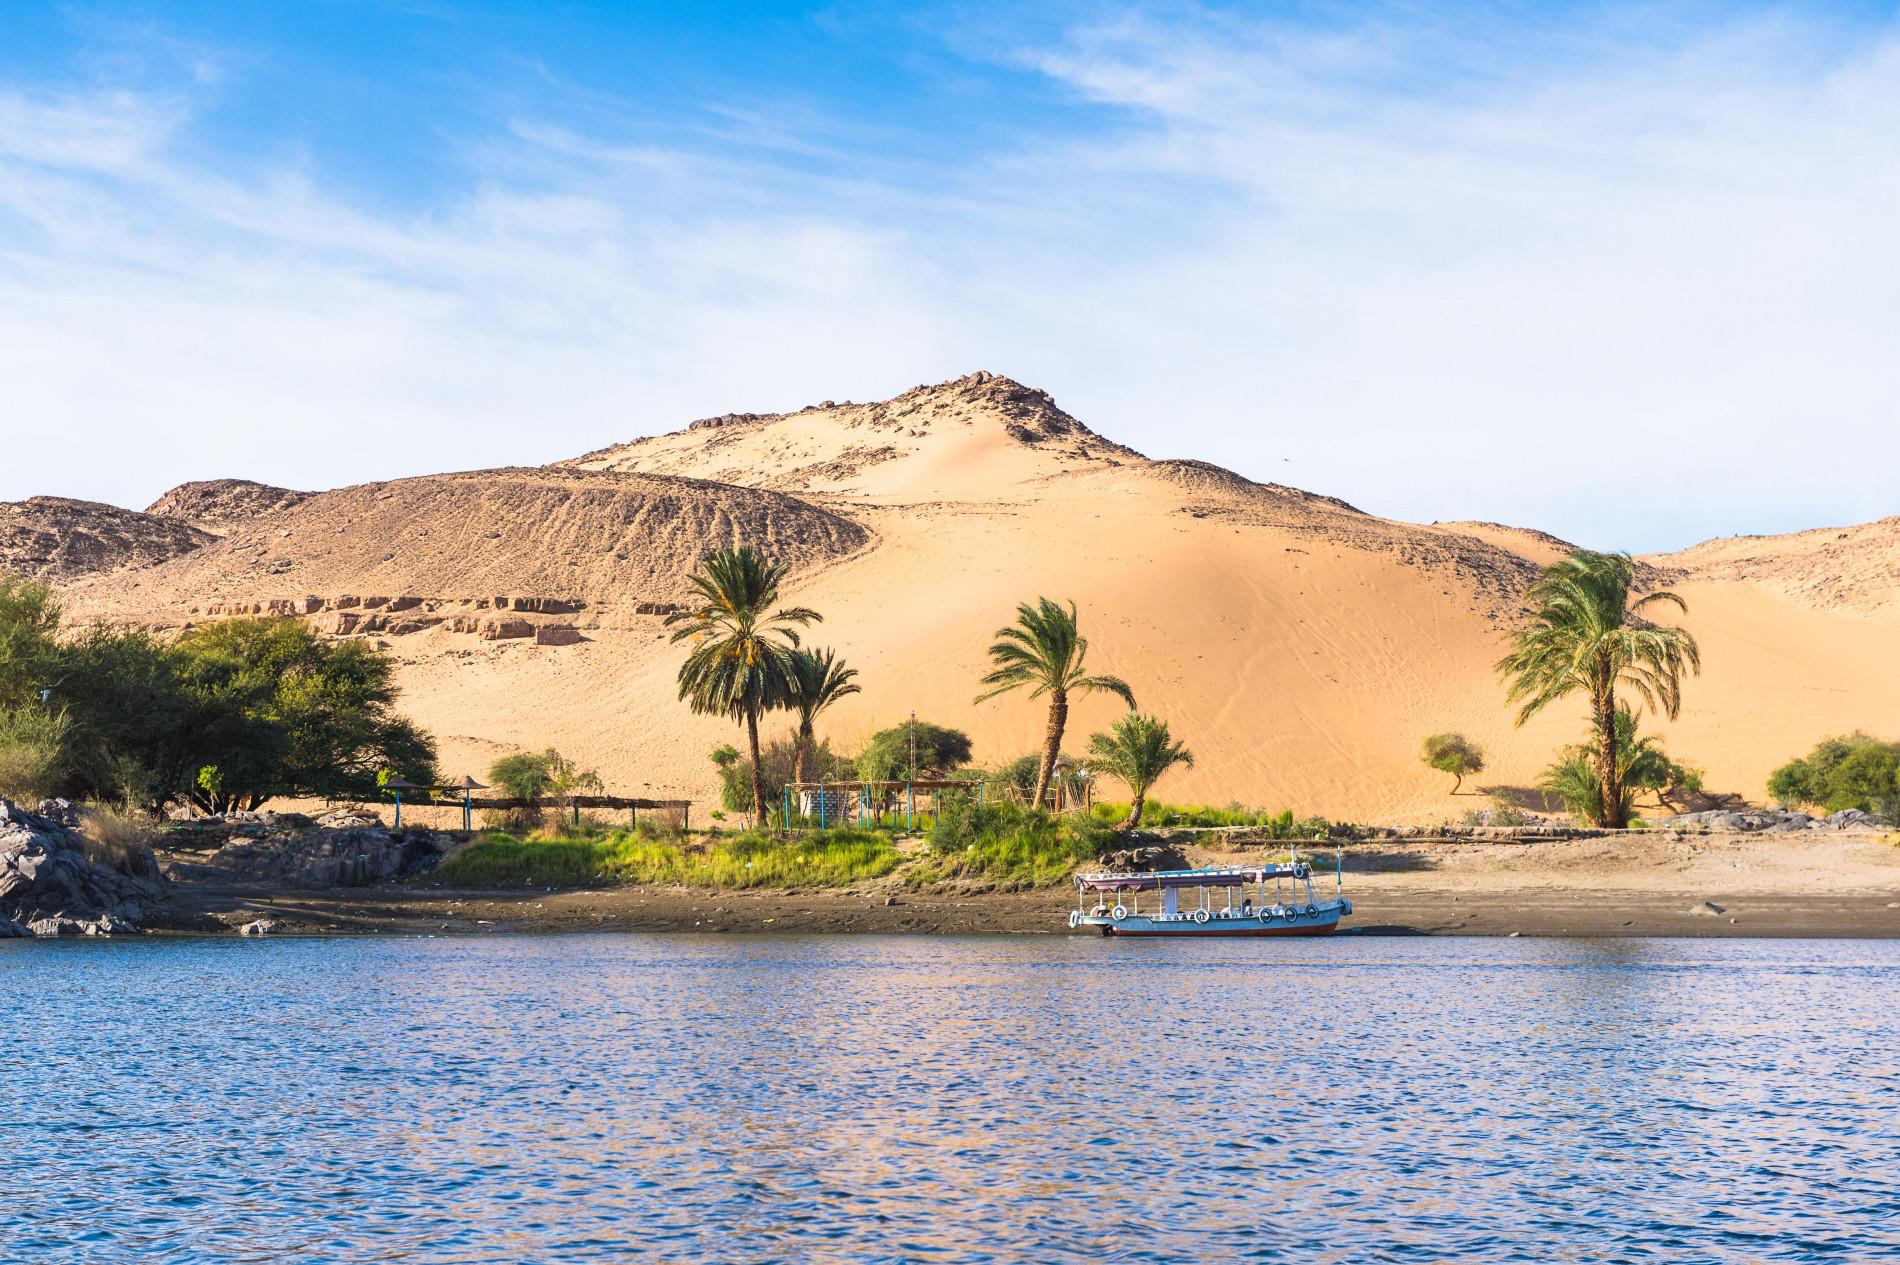 ÉGYPTE: Sphinx, Pyramides et Nil